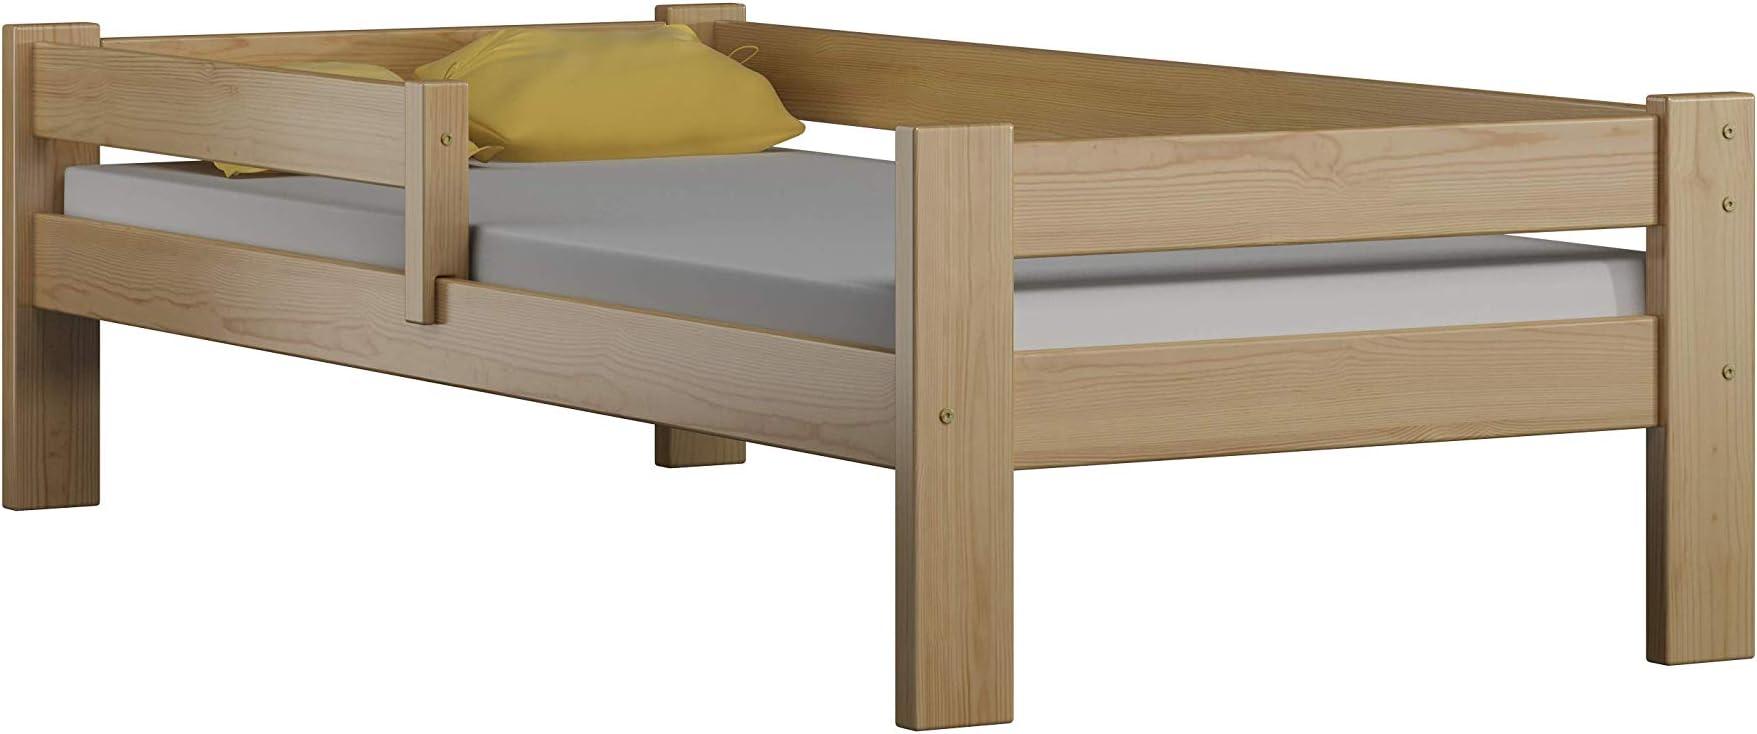 Childrens Beds Home Cama Individual de Madera de Pino Macizo - Sauce sin cajones ni colchón Incluido (180x90, Natural)